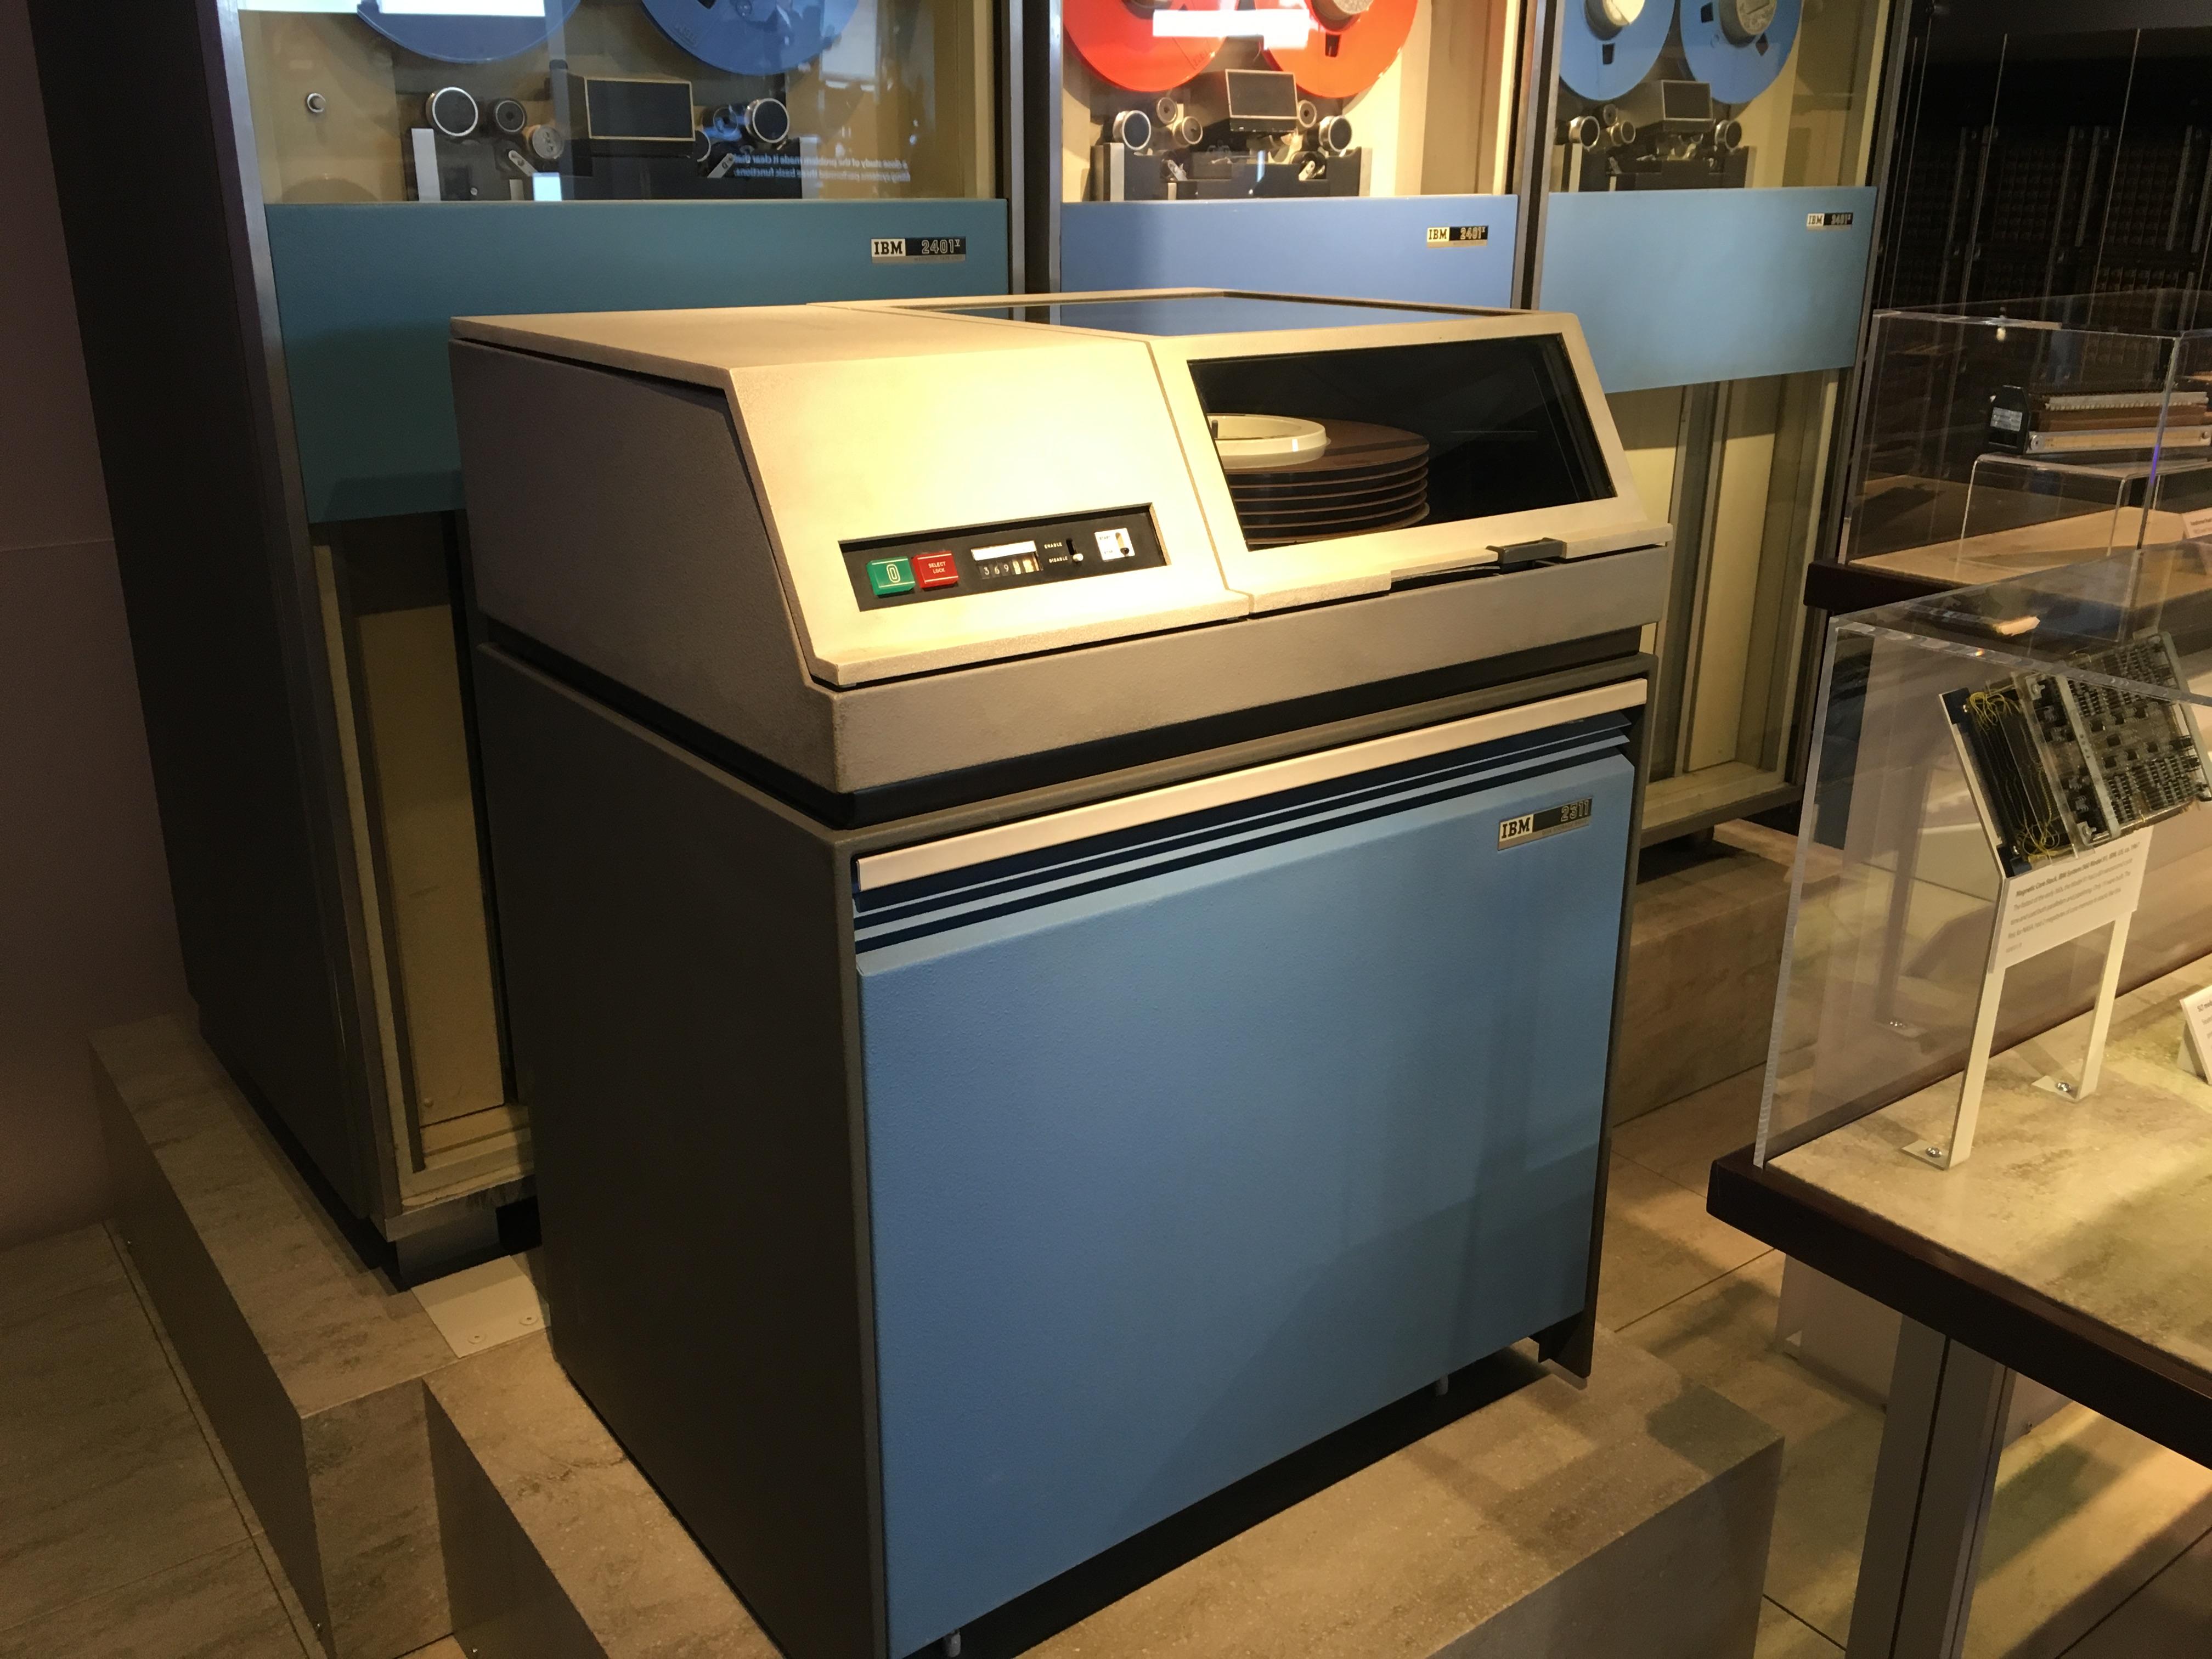 File:IBM 2311 Disk Drive.agr.jpg